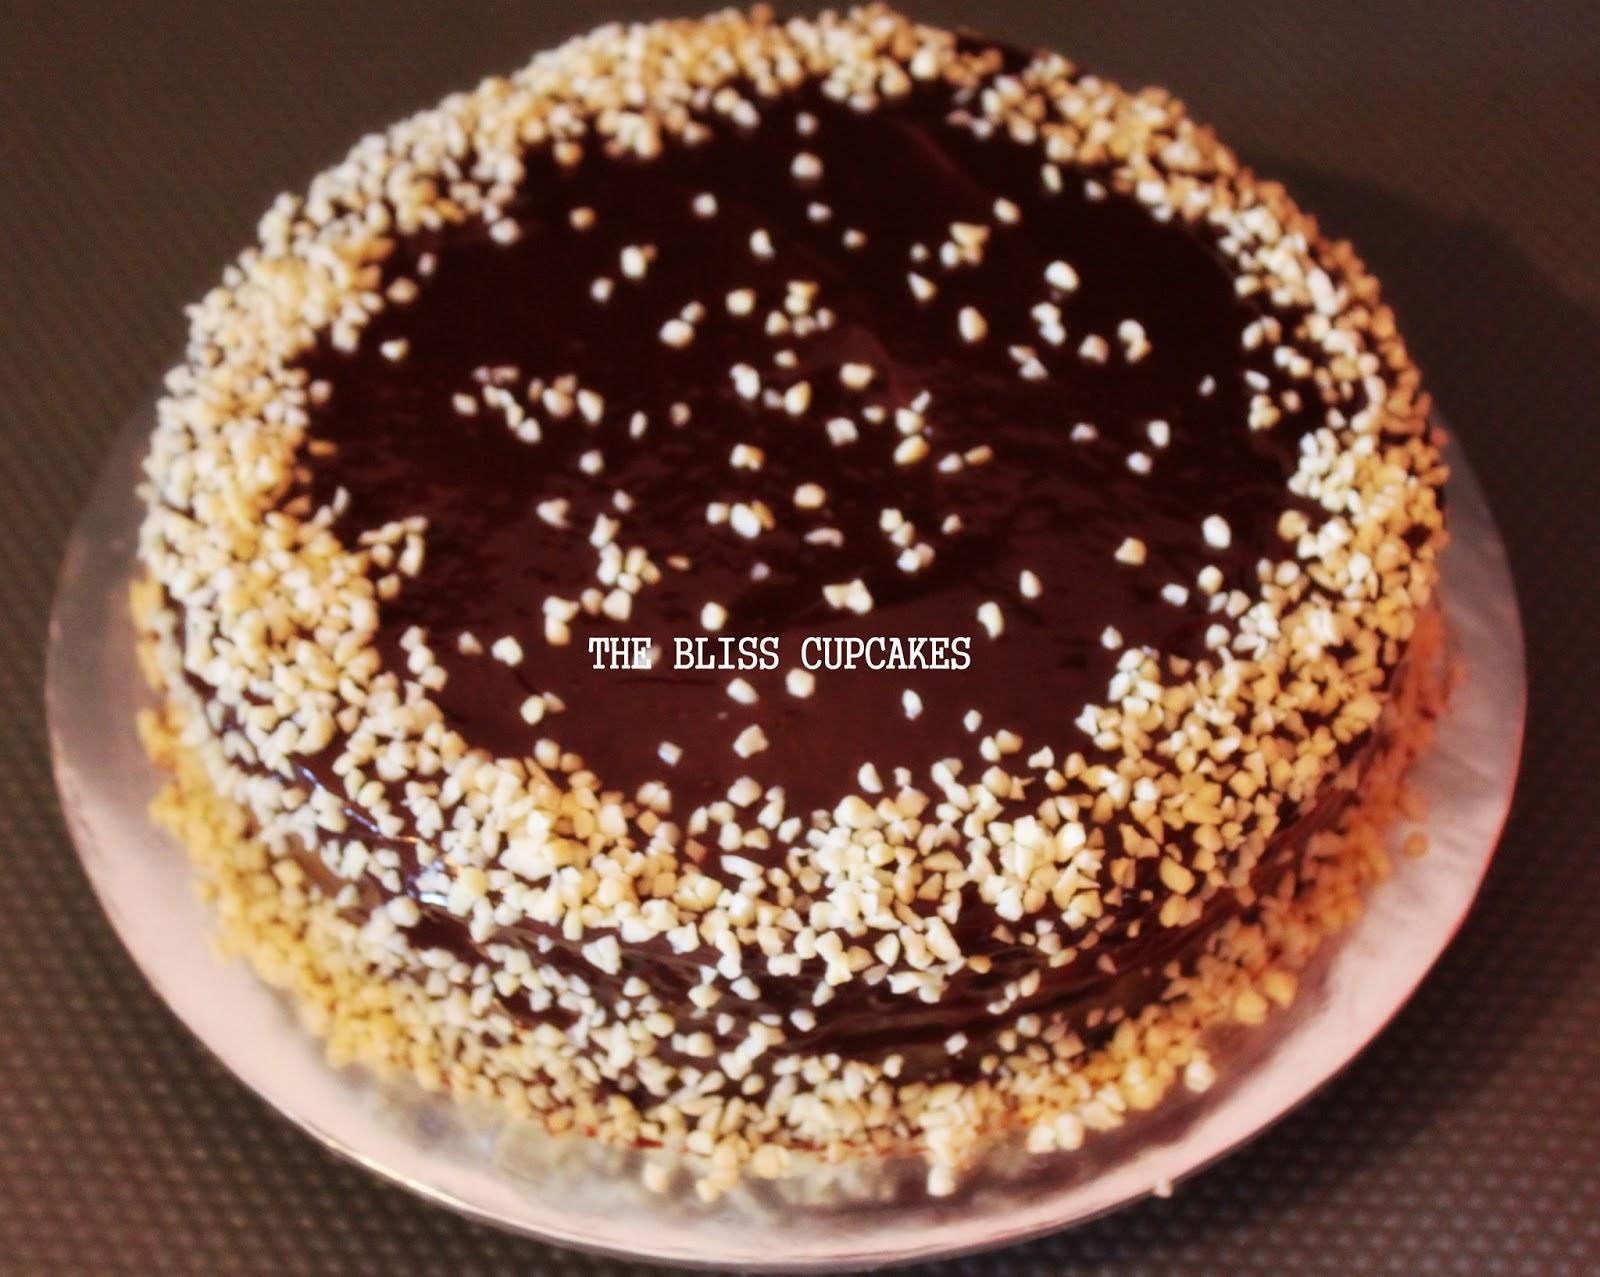 The Bliss Cupcakes Belgium Almond Birthday Cake